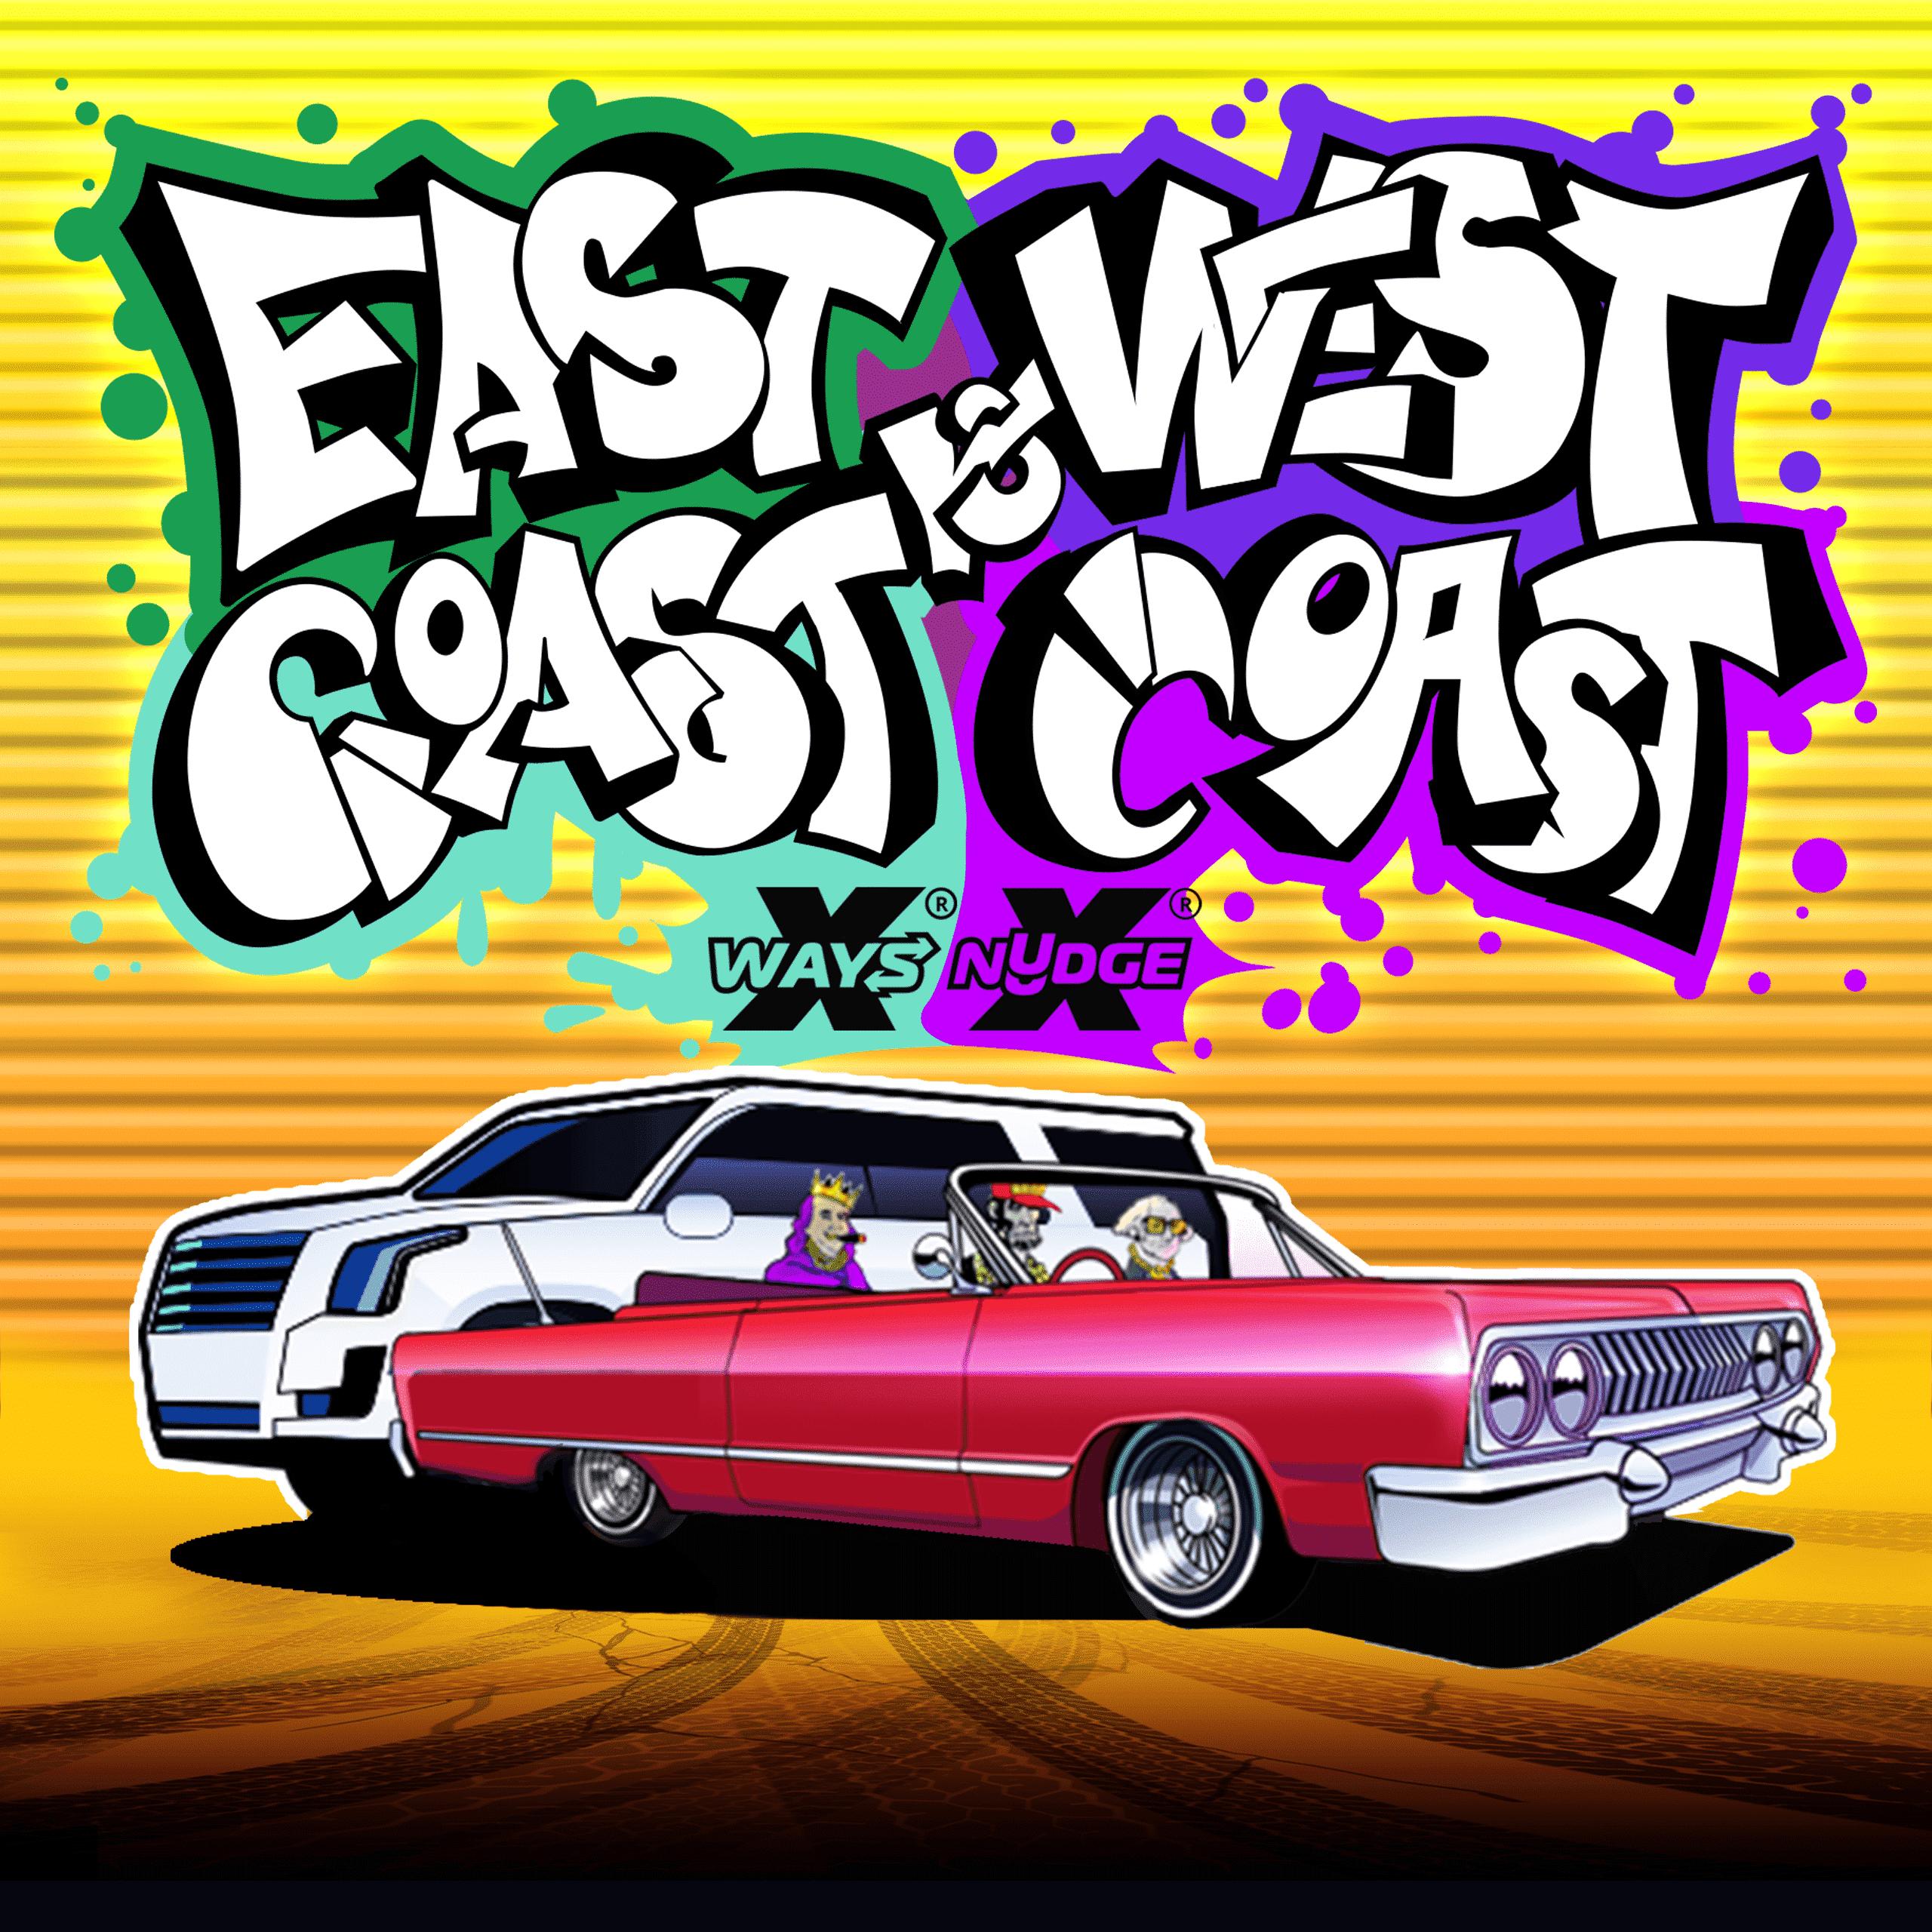 East Cost vs West Coast Logo